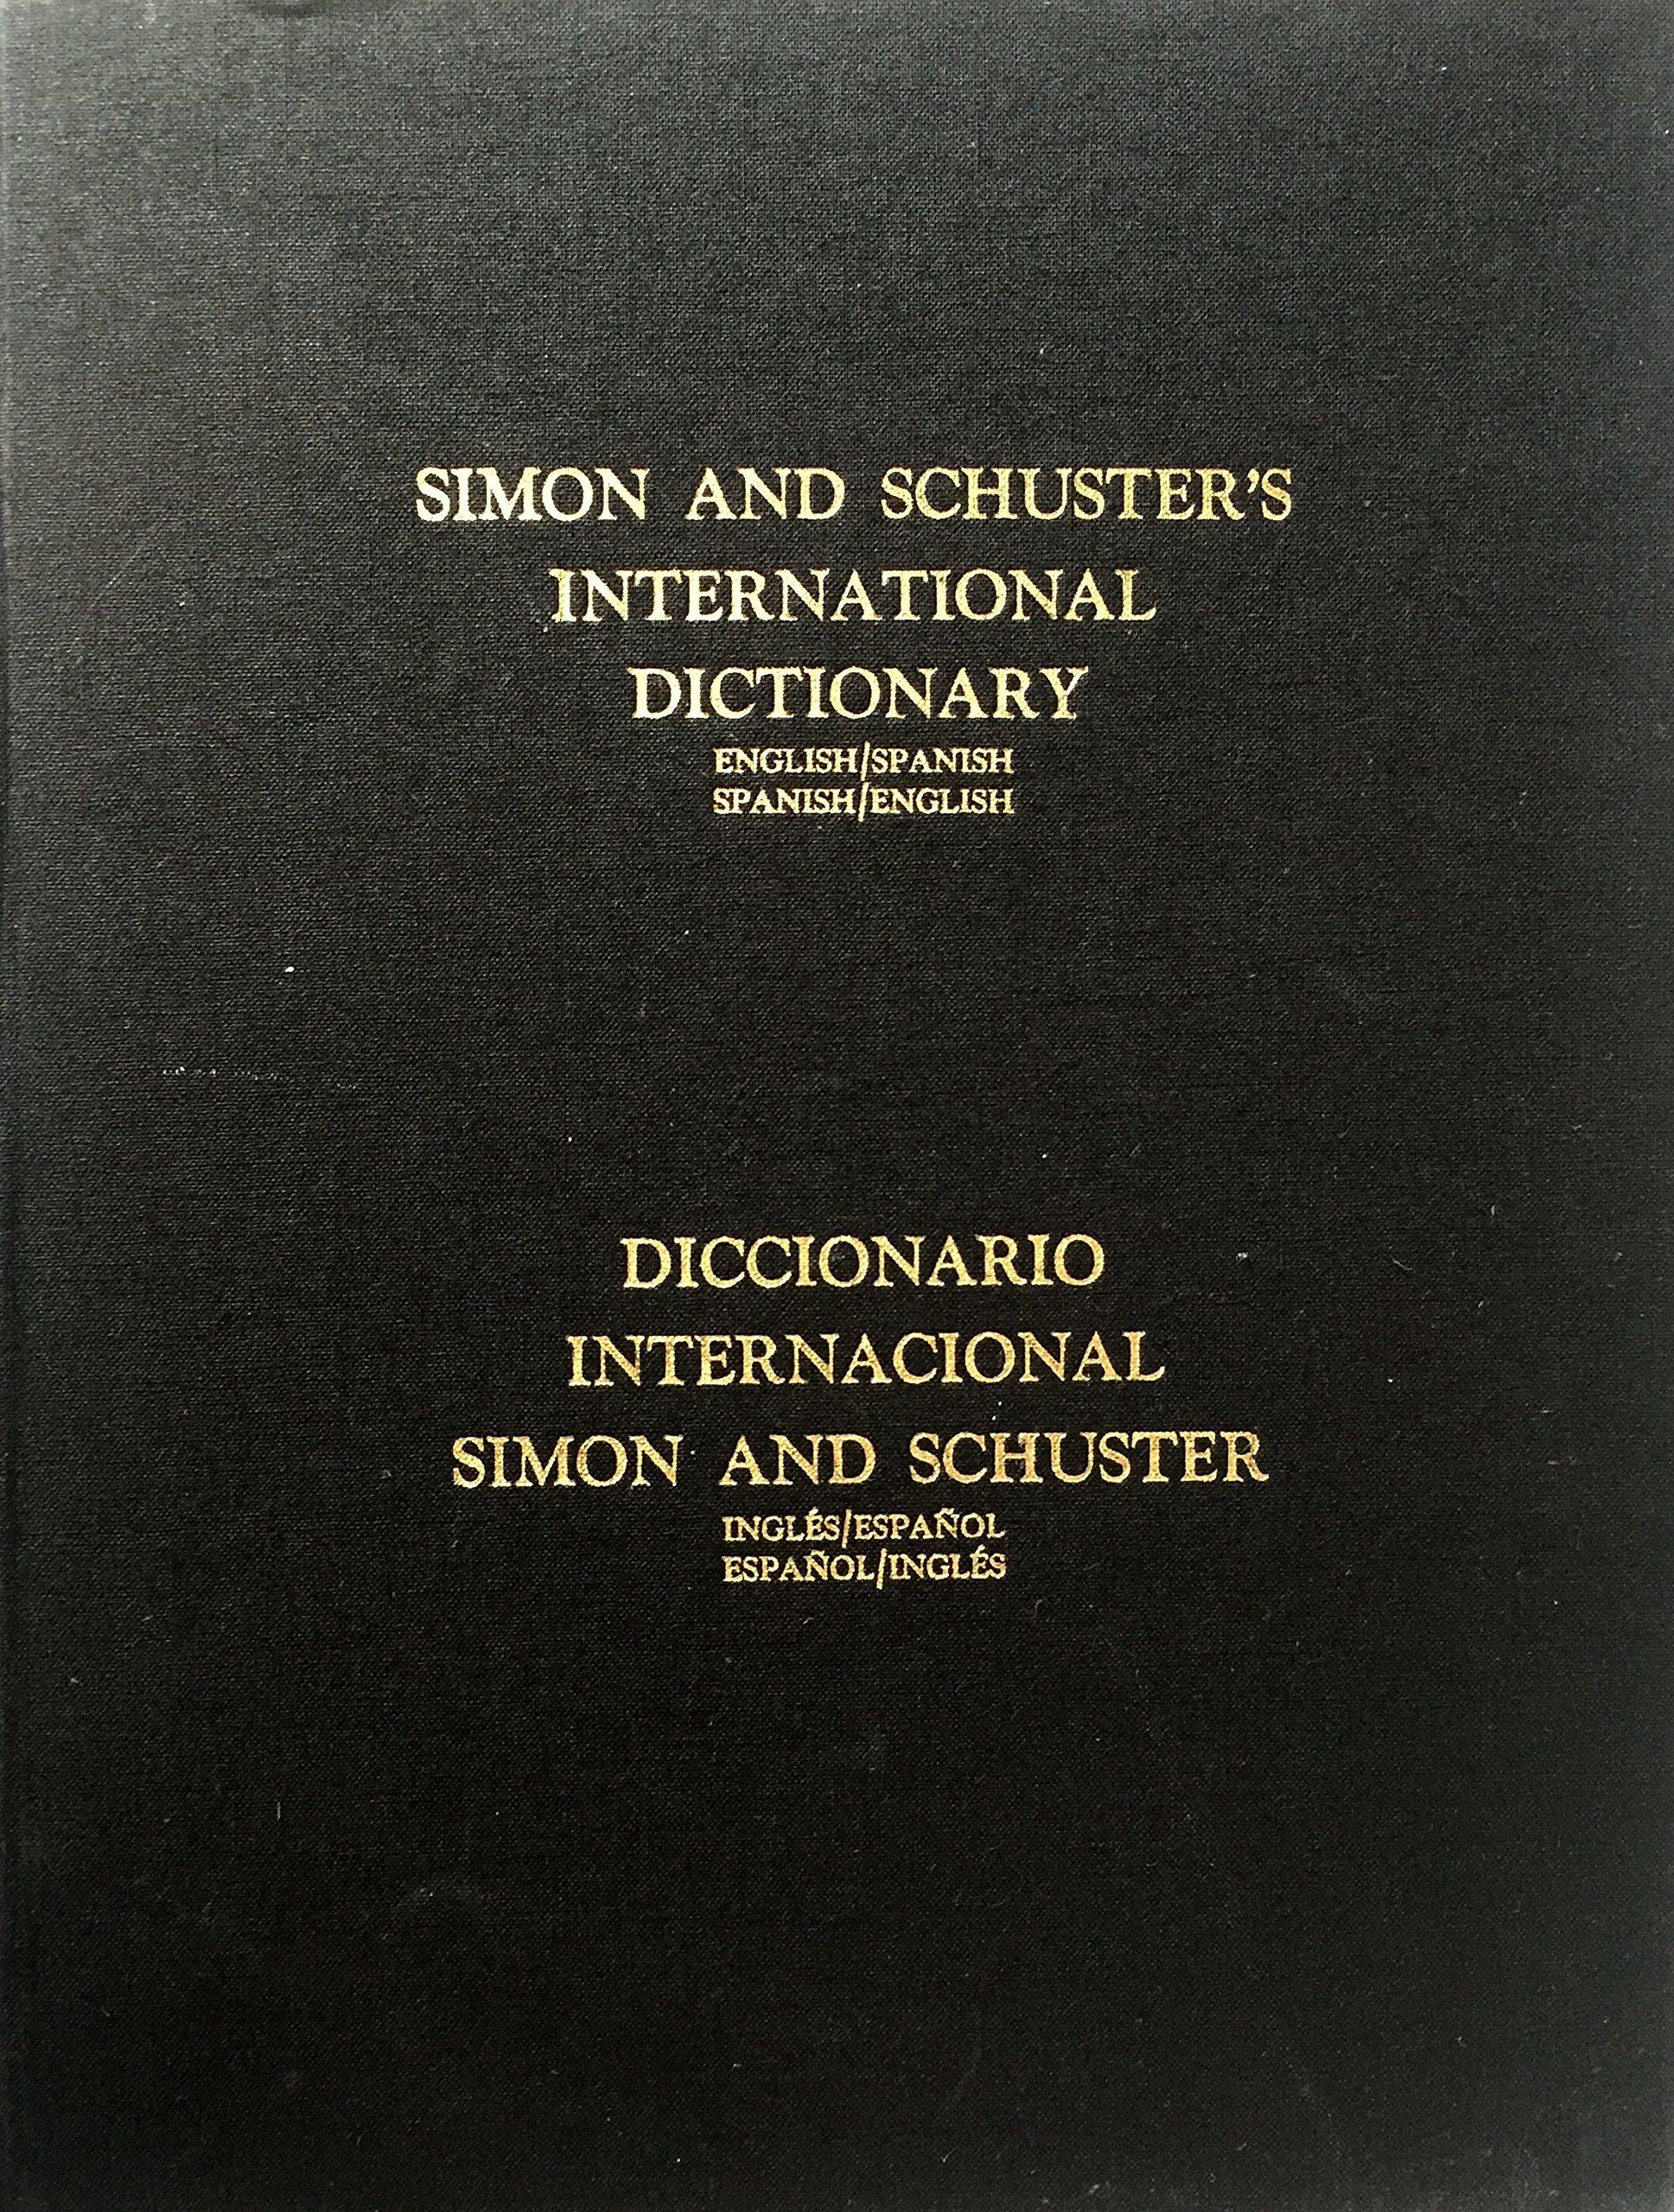 Simon and Schuster's International Dictionary: English/Spanish, Spanish/ English w/Thumb Index Hardcover – 1973